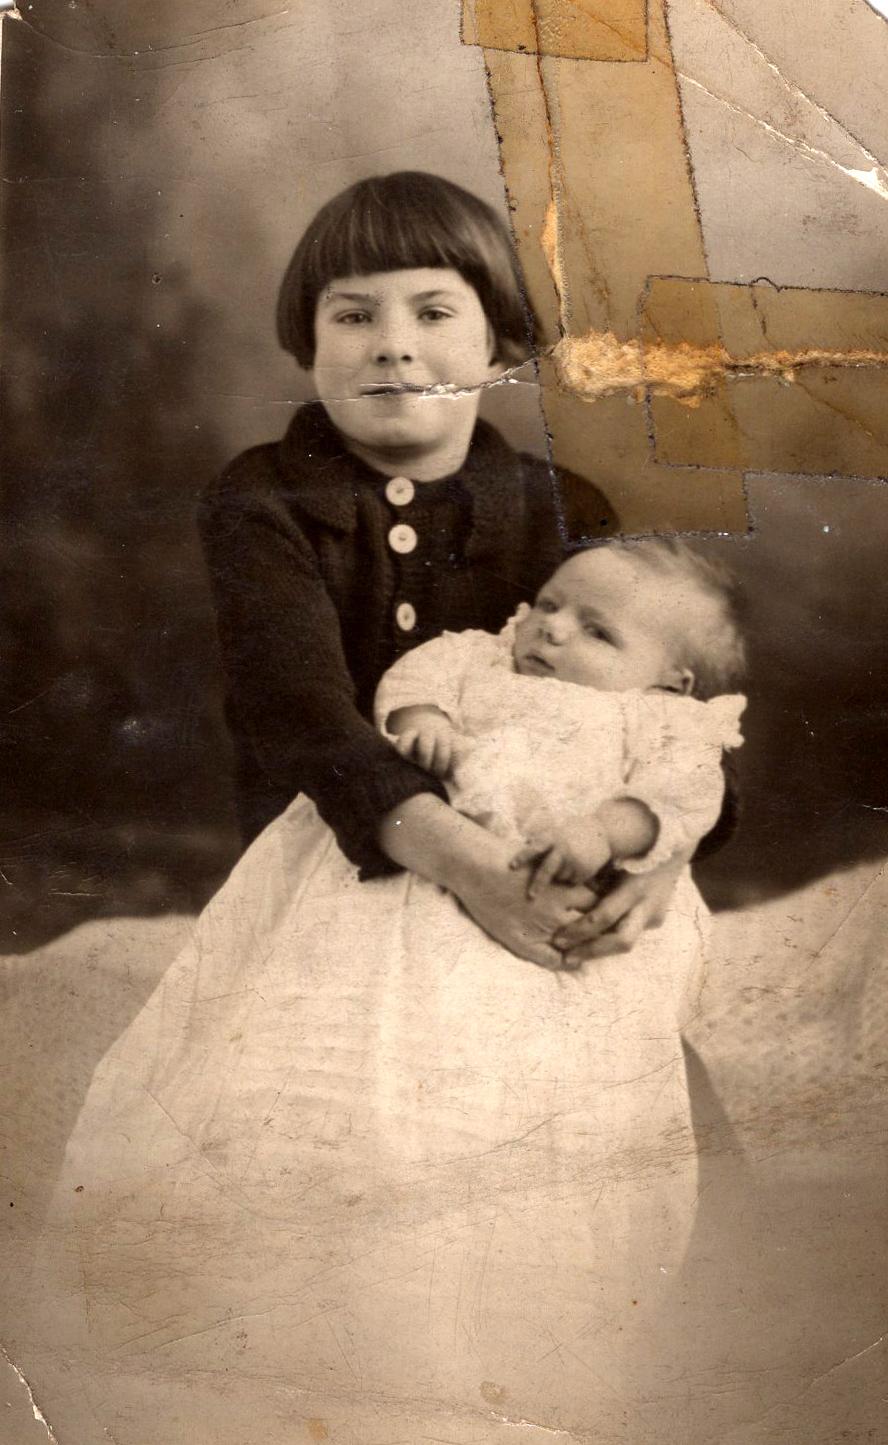 Studio Portrait Girl Holding Baby, 15th February 1933